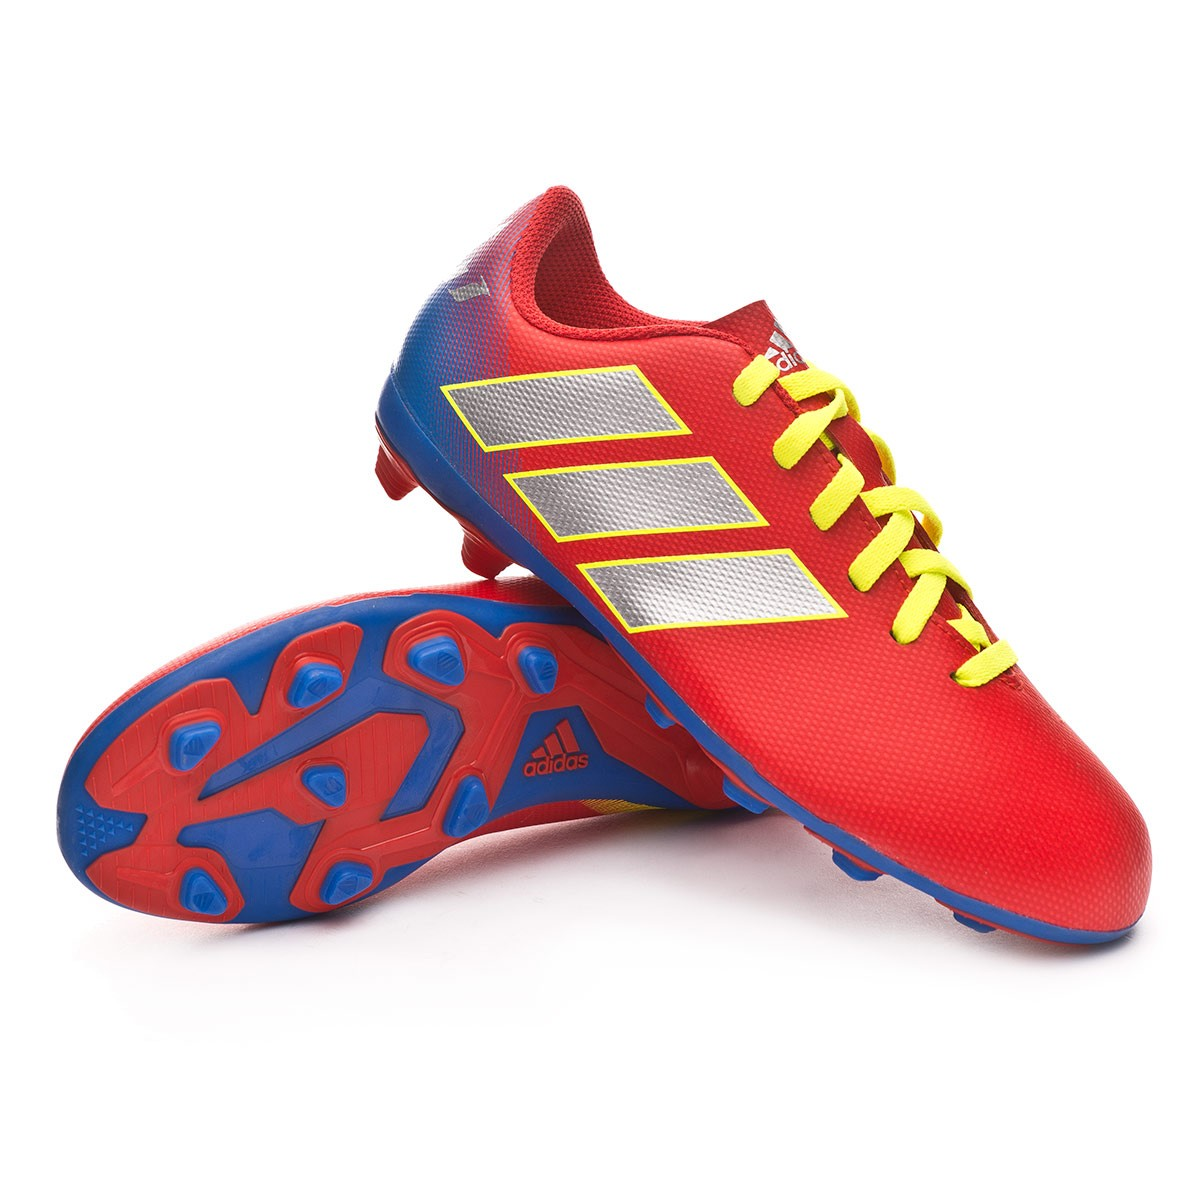 Chuteira Adidas Nemeziz Messi 18.4 FG Campo Infantil